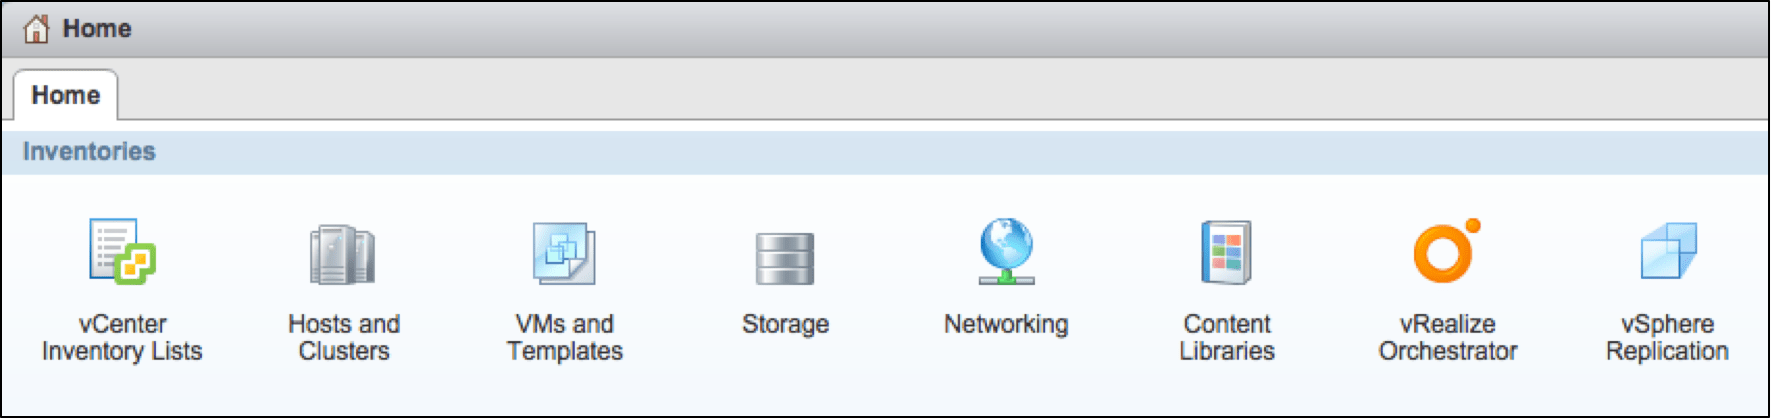 Vsphere Replication Unable To Obtain Ssl Certificate Bad Server